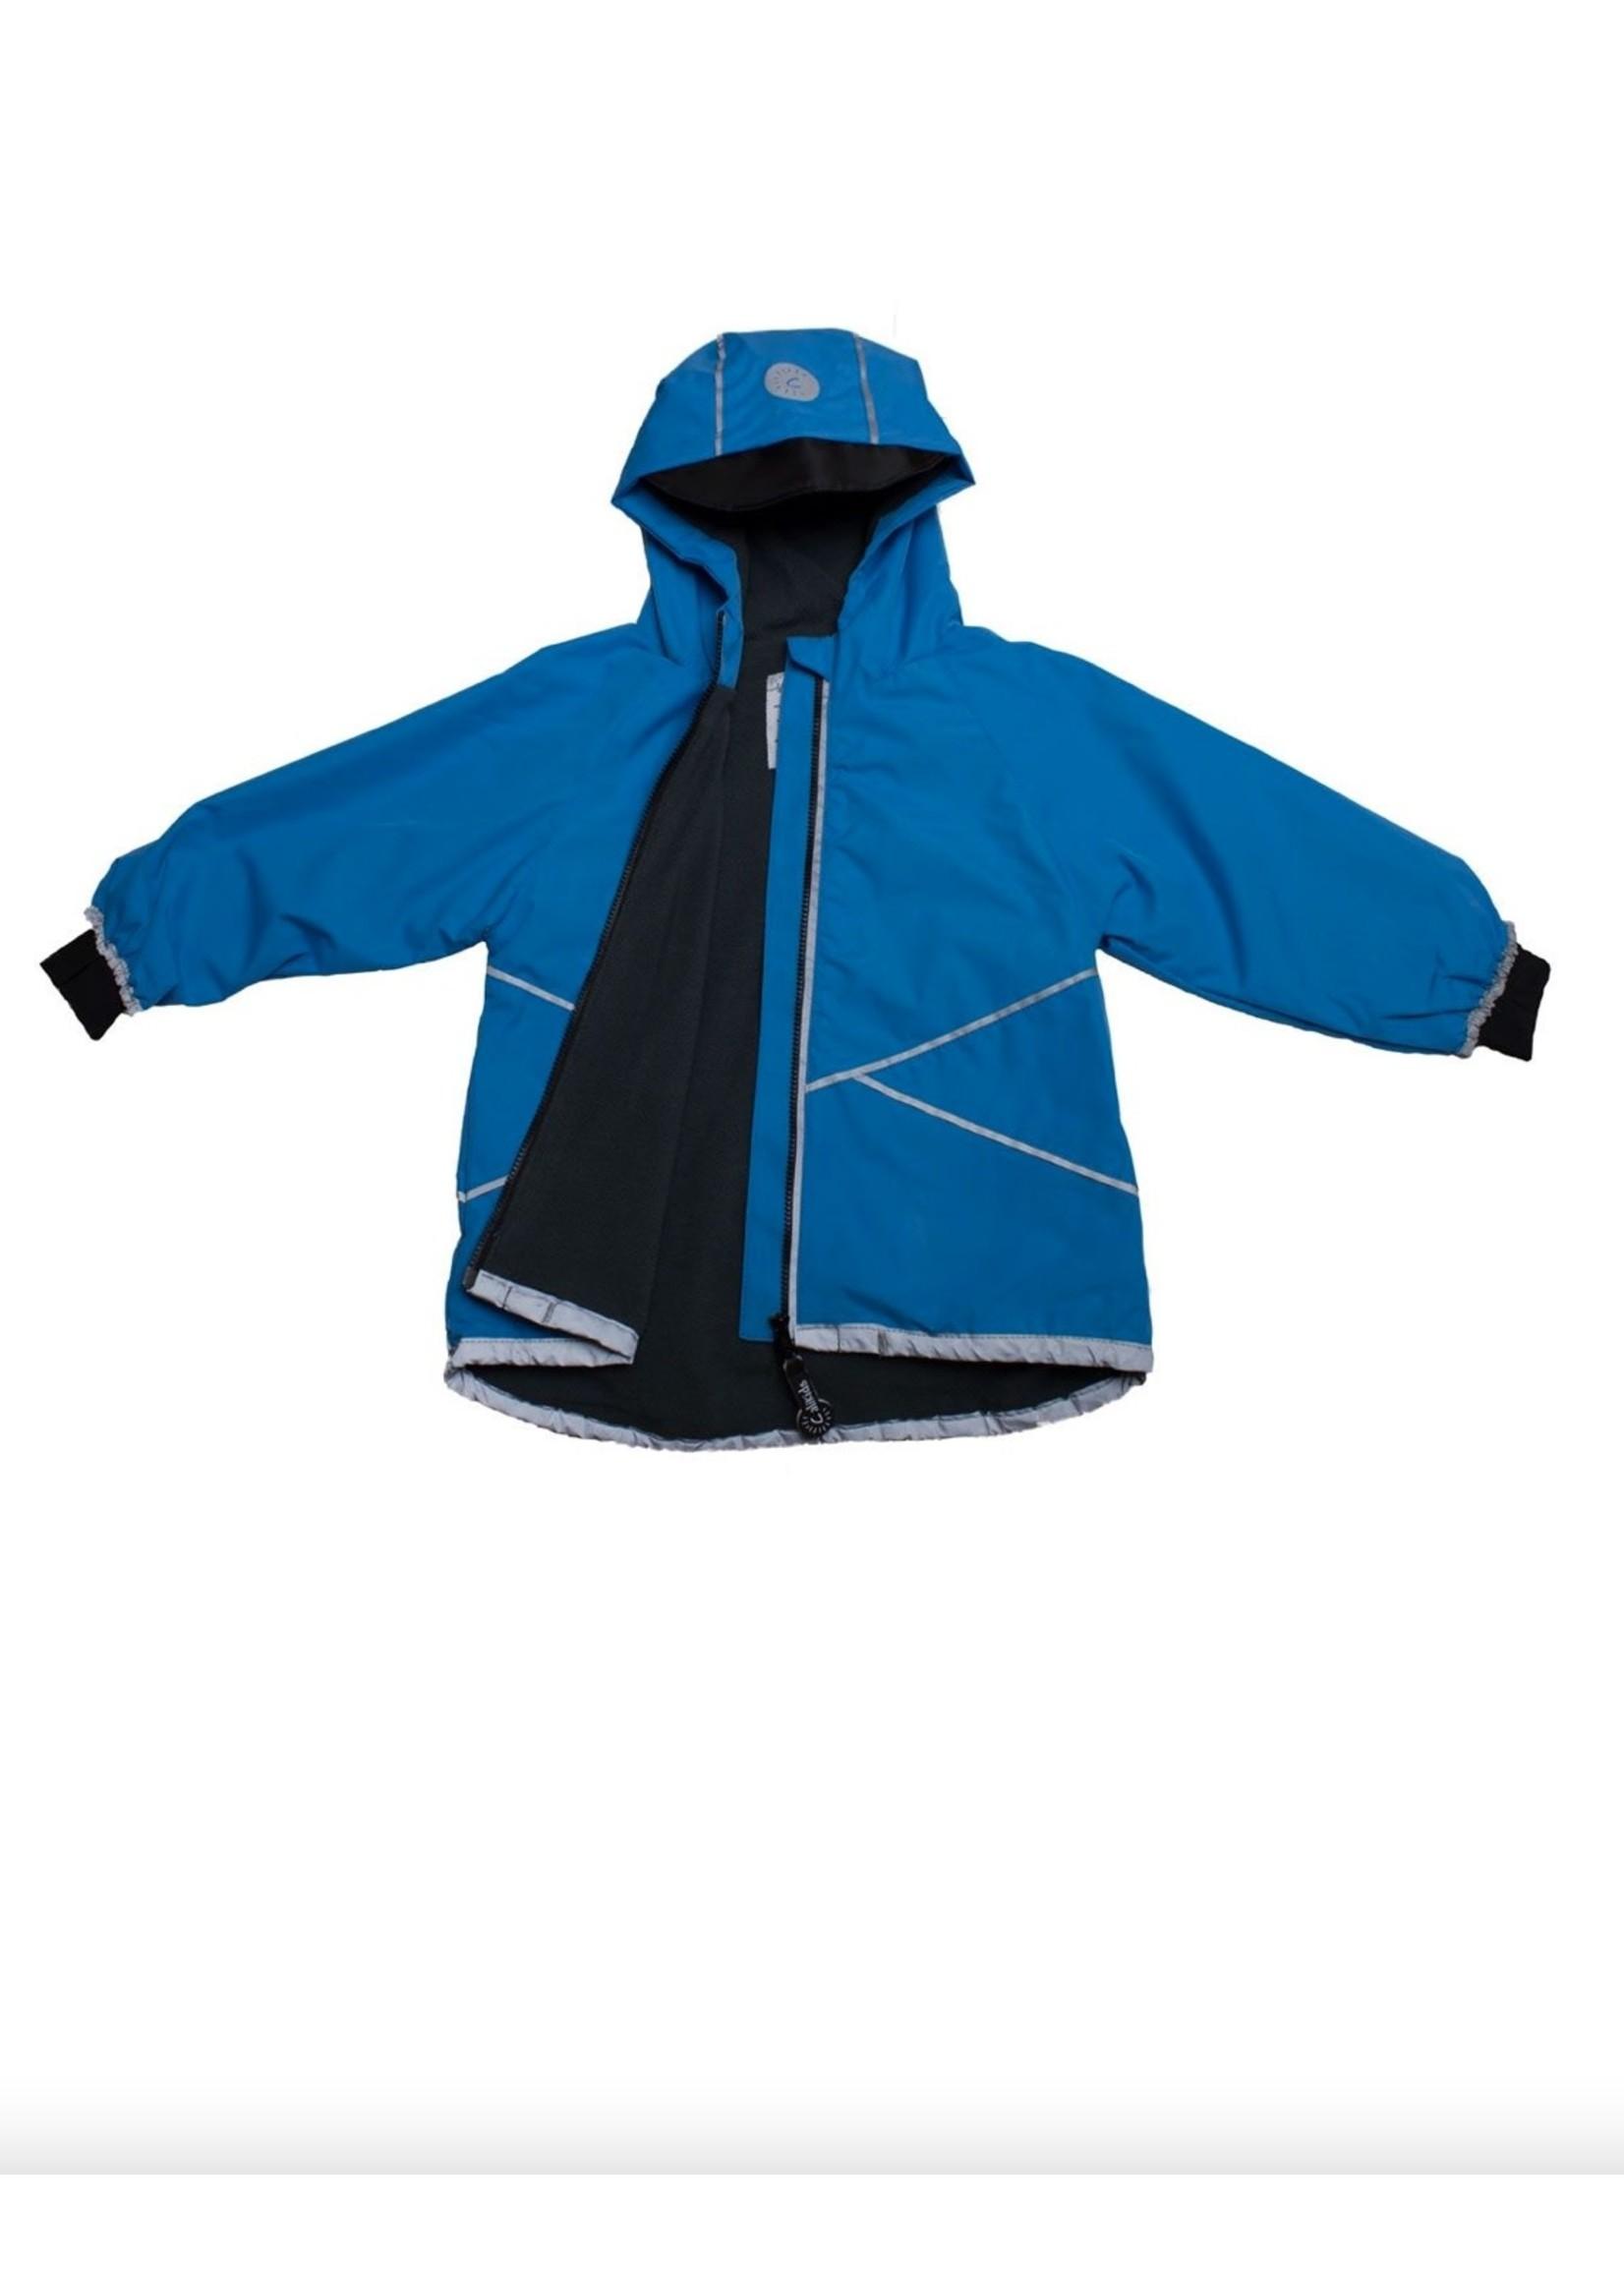 Calikids Calikids, Mid Season Waterproof Lined Baby Jacket